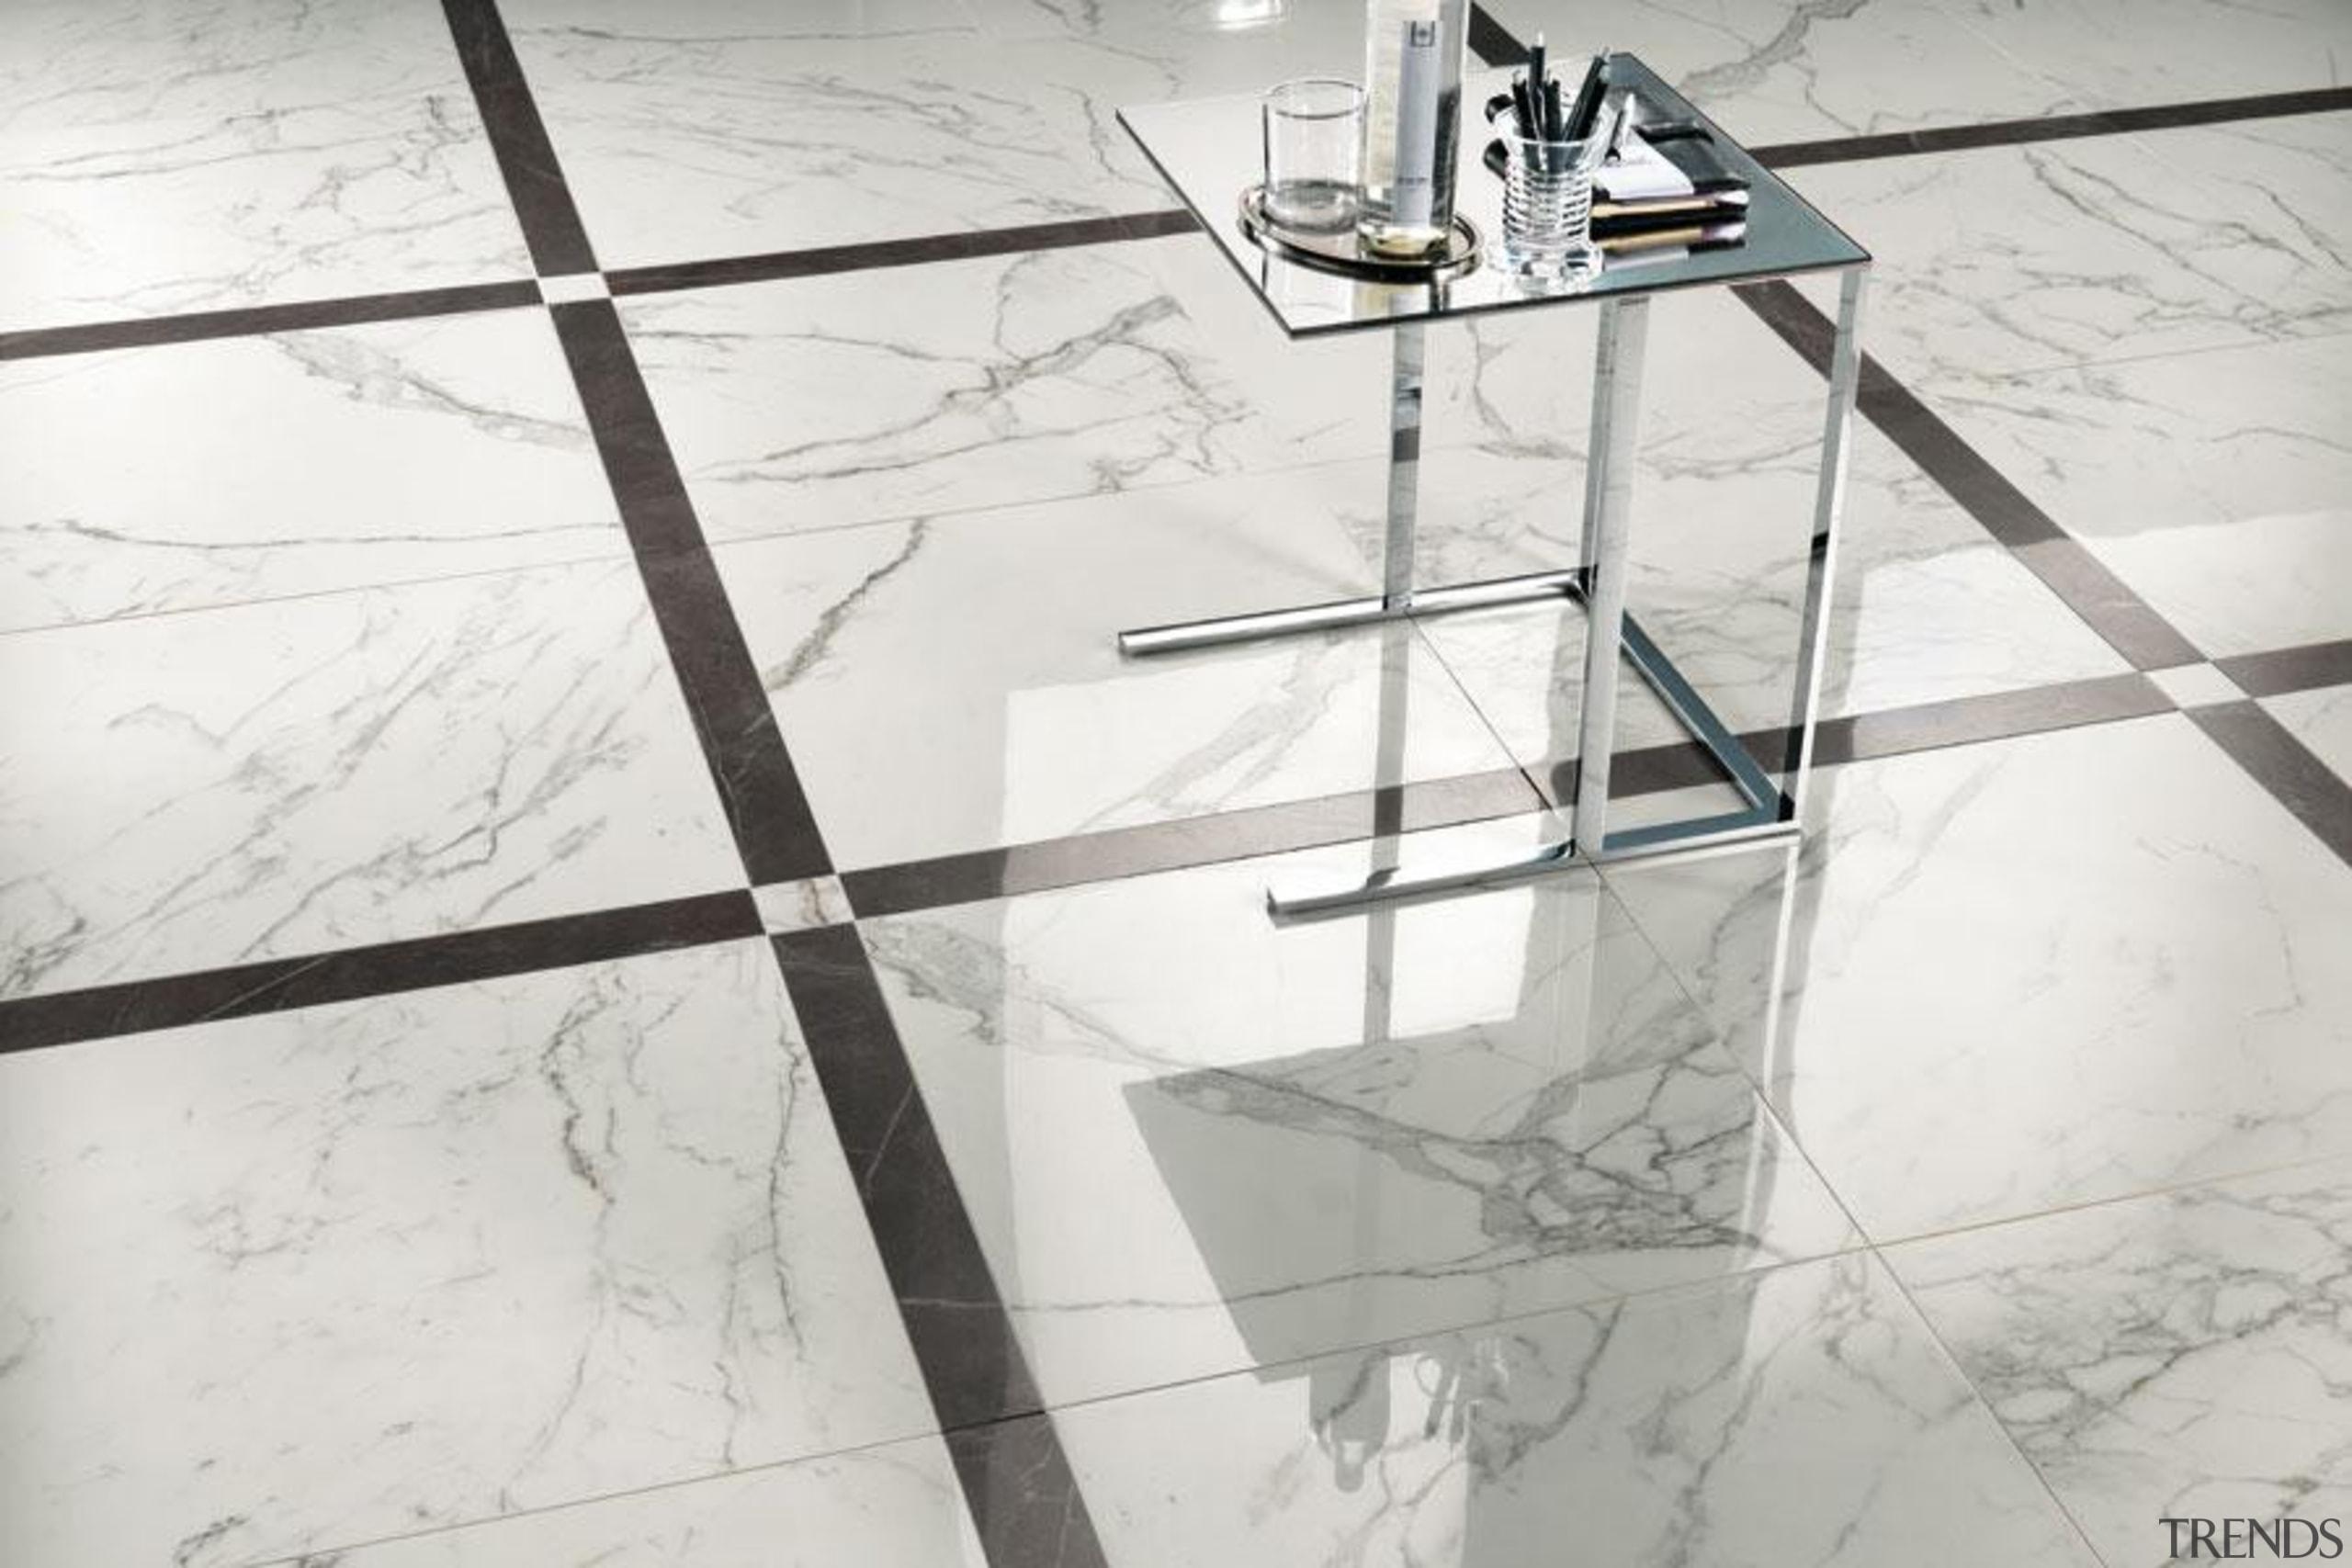 Marvel Calacatta floor tiles - Cb 9721375050116184 - angle, design, floor, flooring, furniture, glass, line, product design, structure, table, tile, wall, white